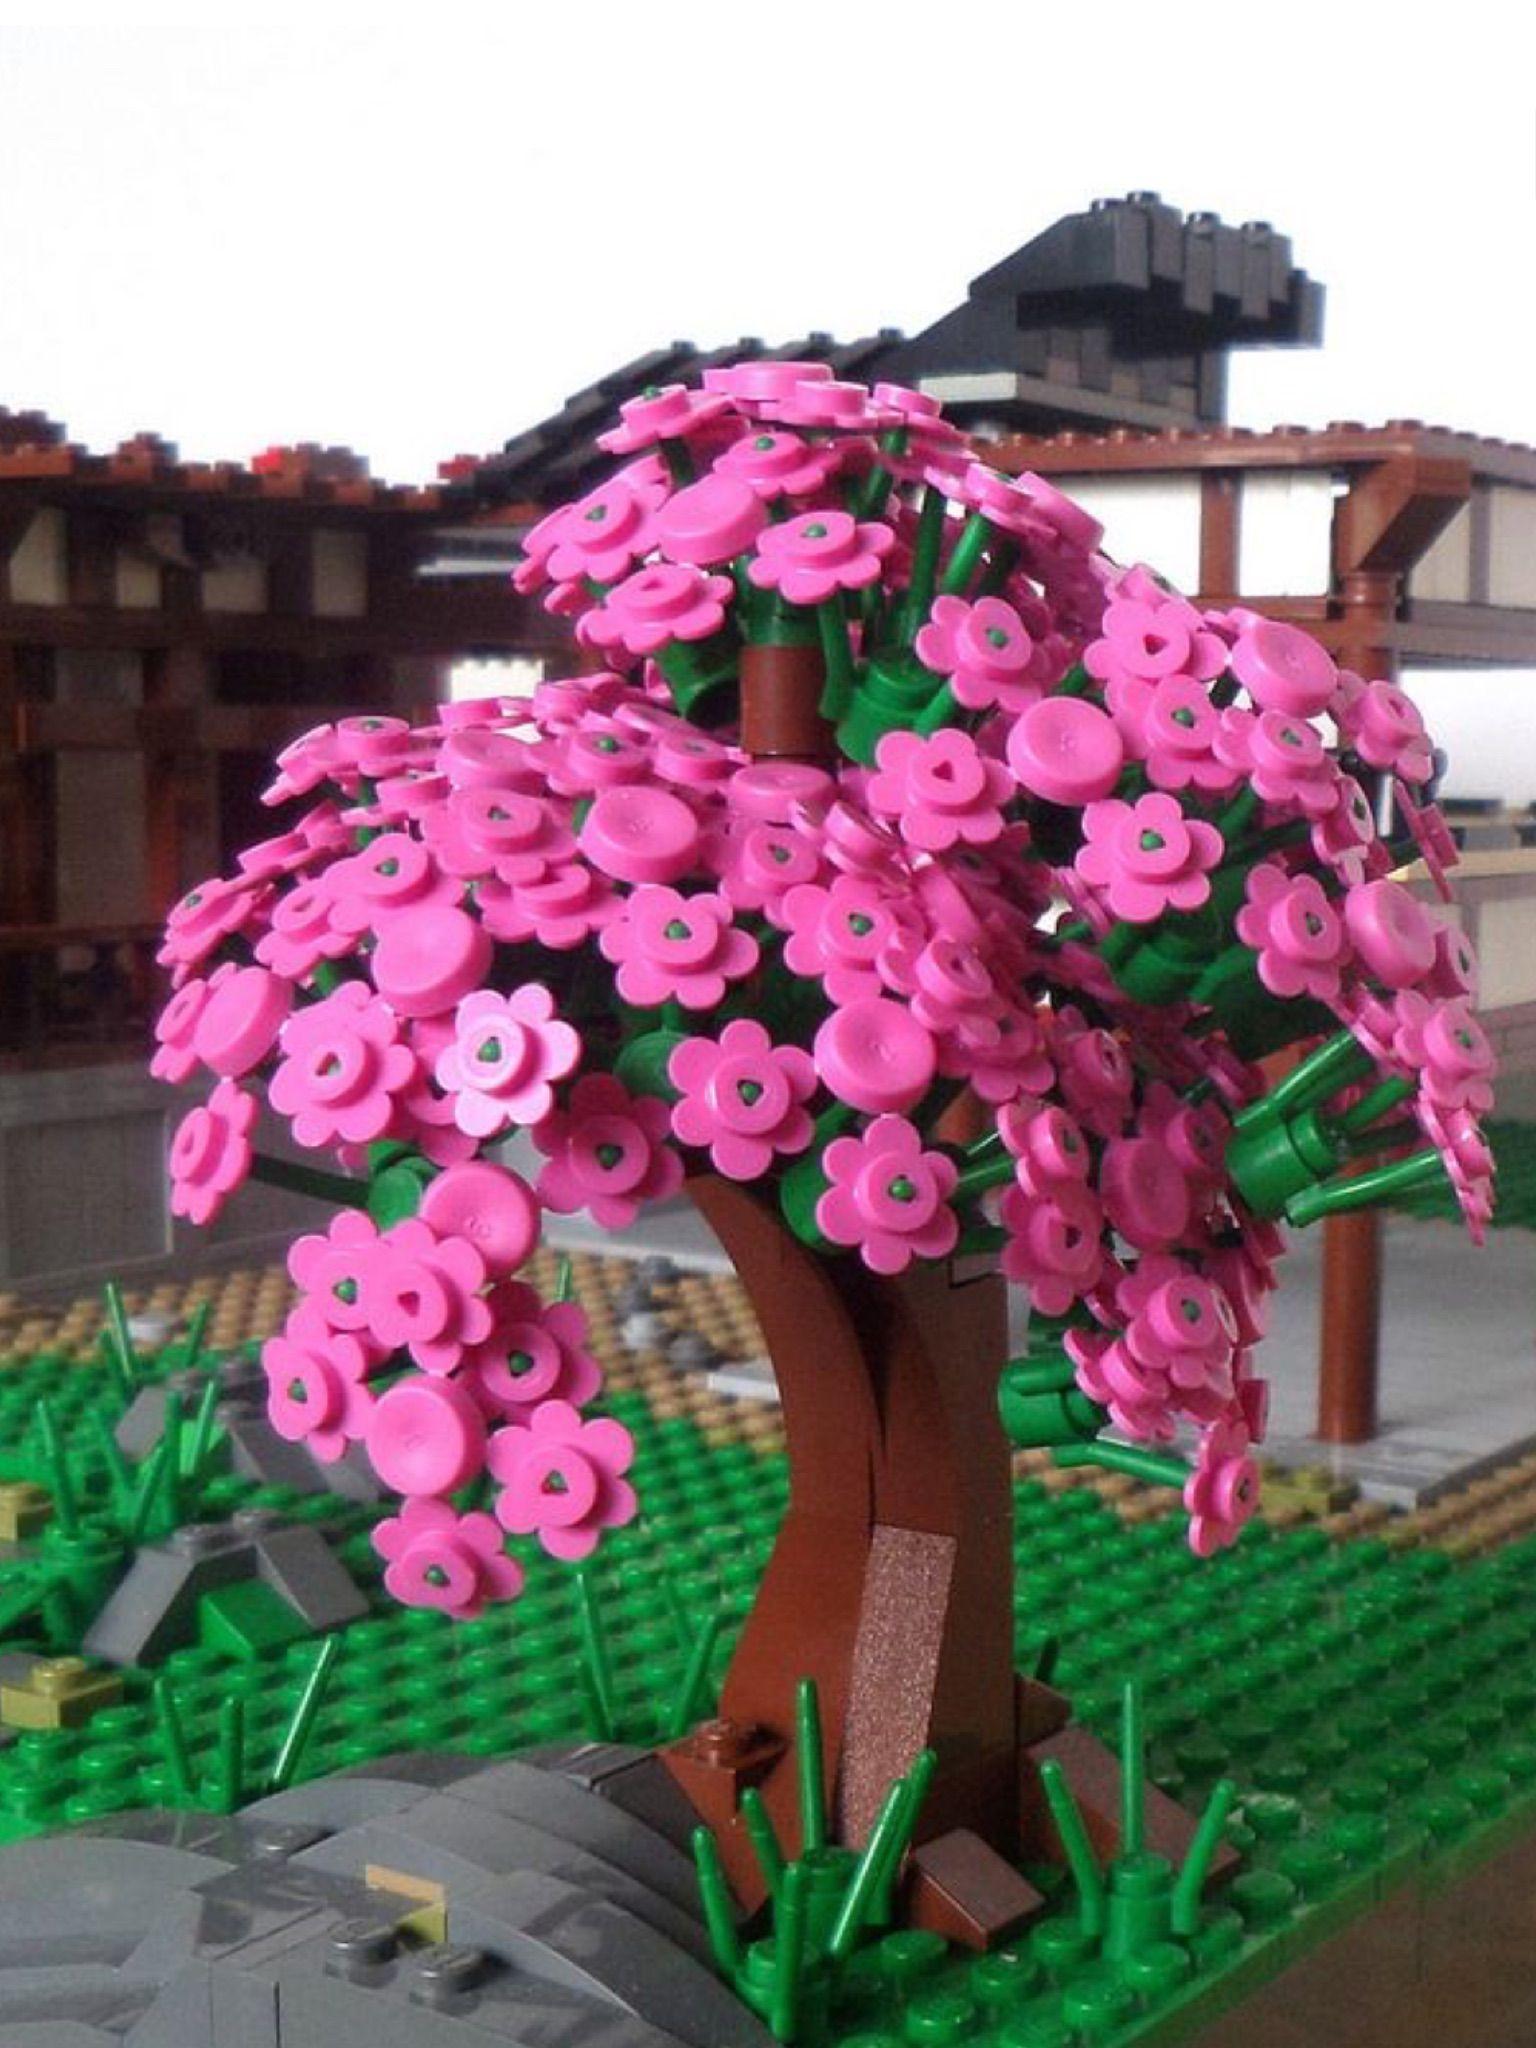 Lego Cherry Tree Lego Flower Lego Tree Lego Display